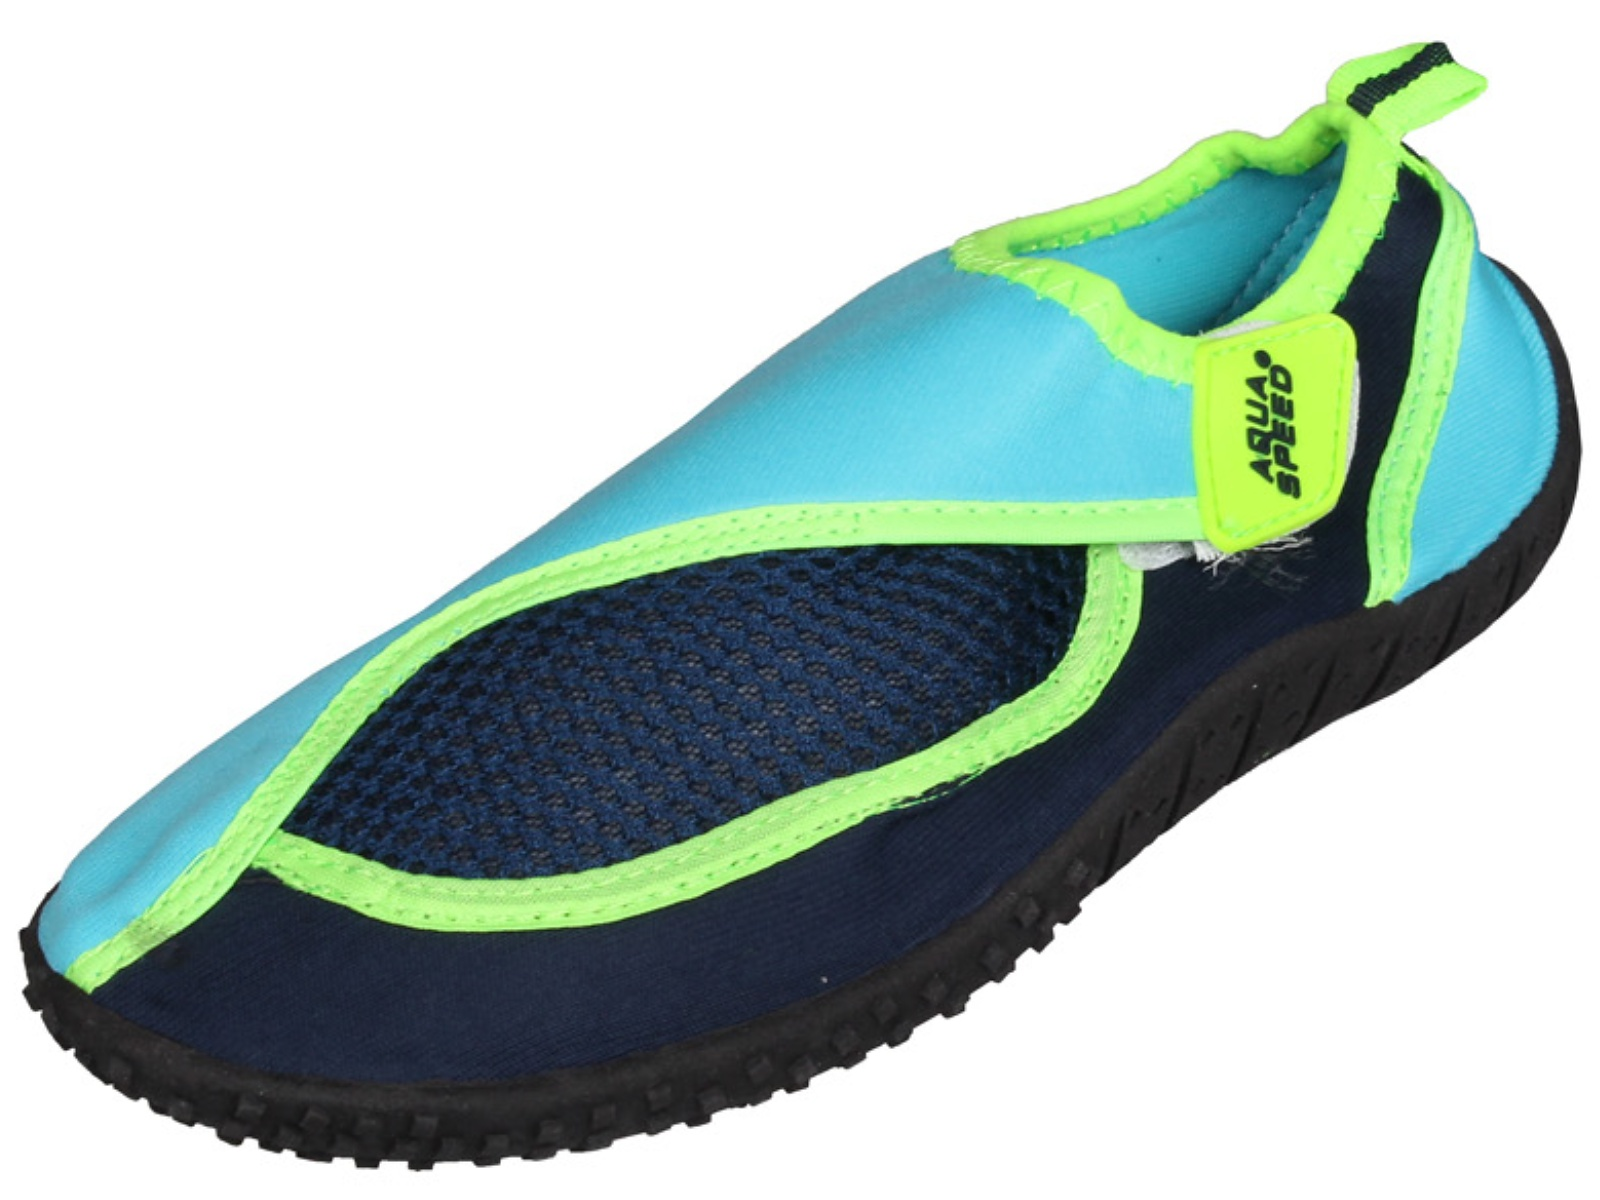 Topánky do vody AQUA-SPEED 26B detské modré - veľ. 29